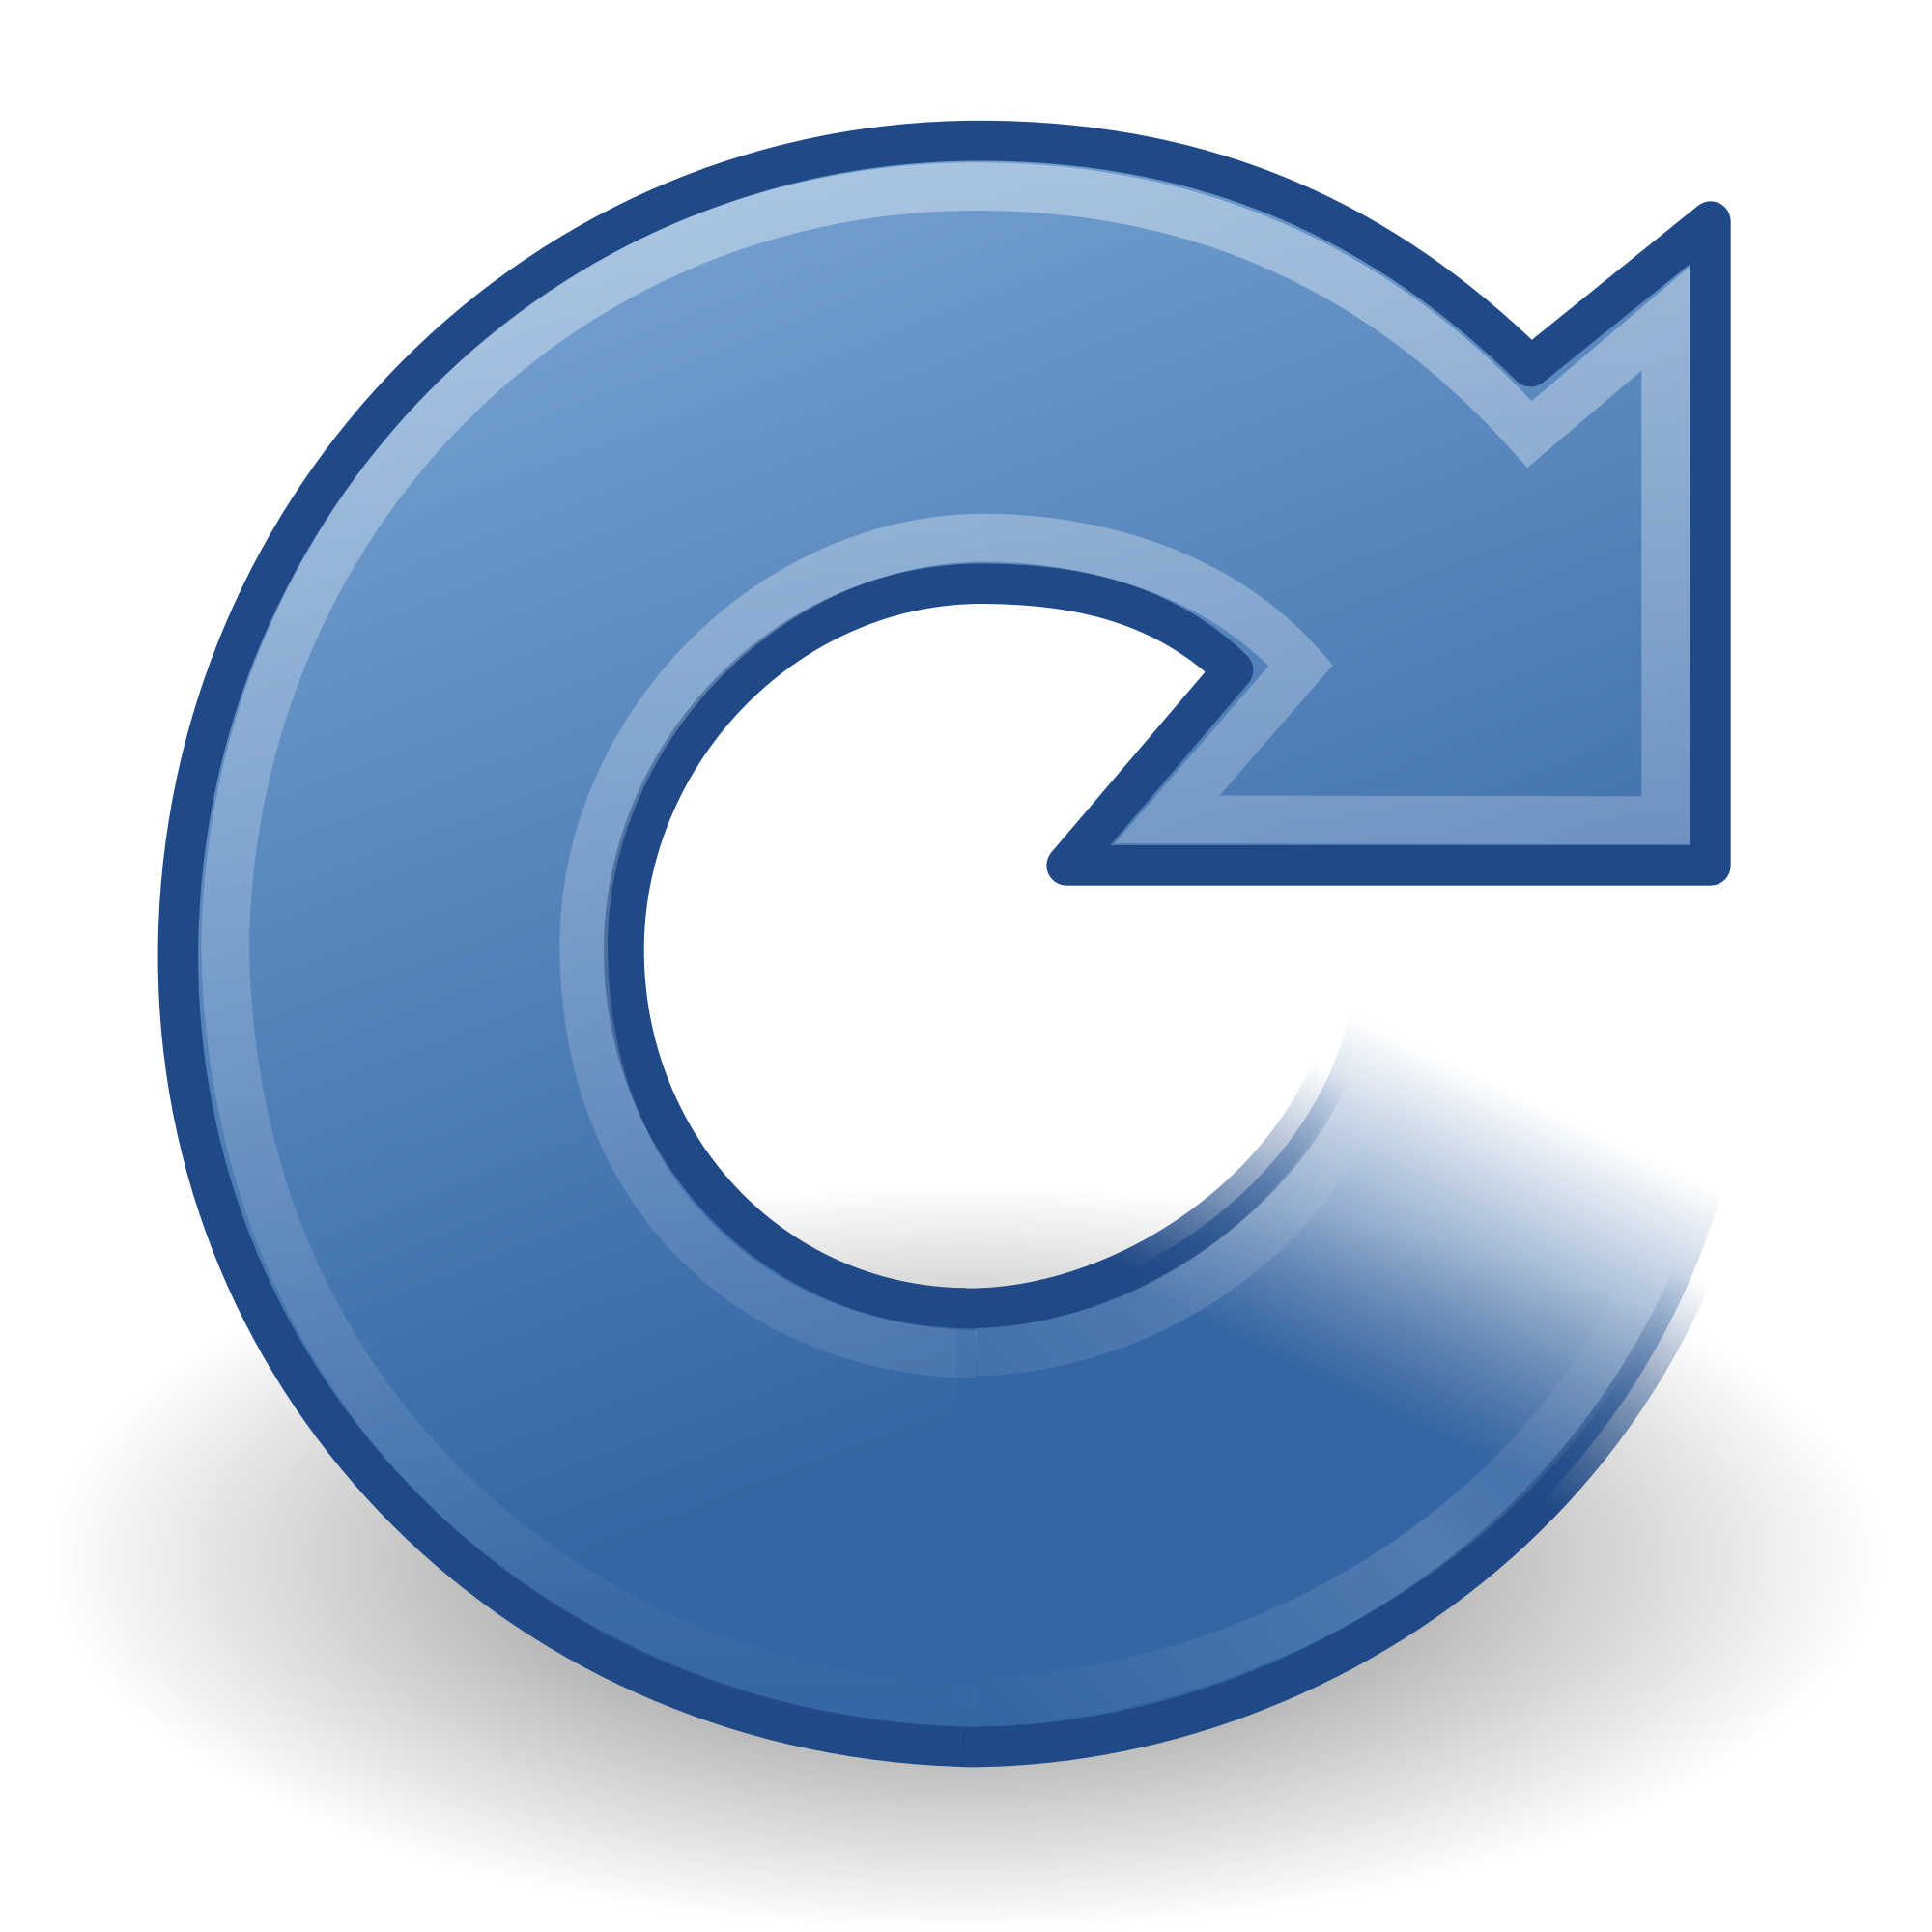 Gnome clipart color. File colors view refresh